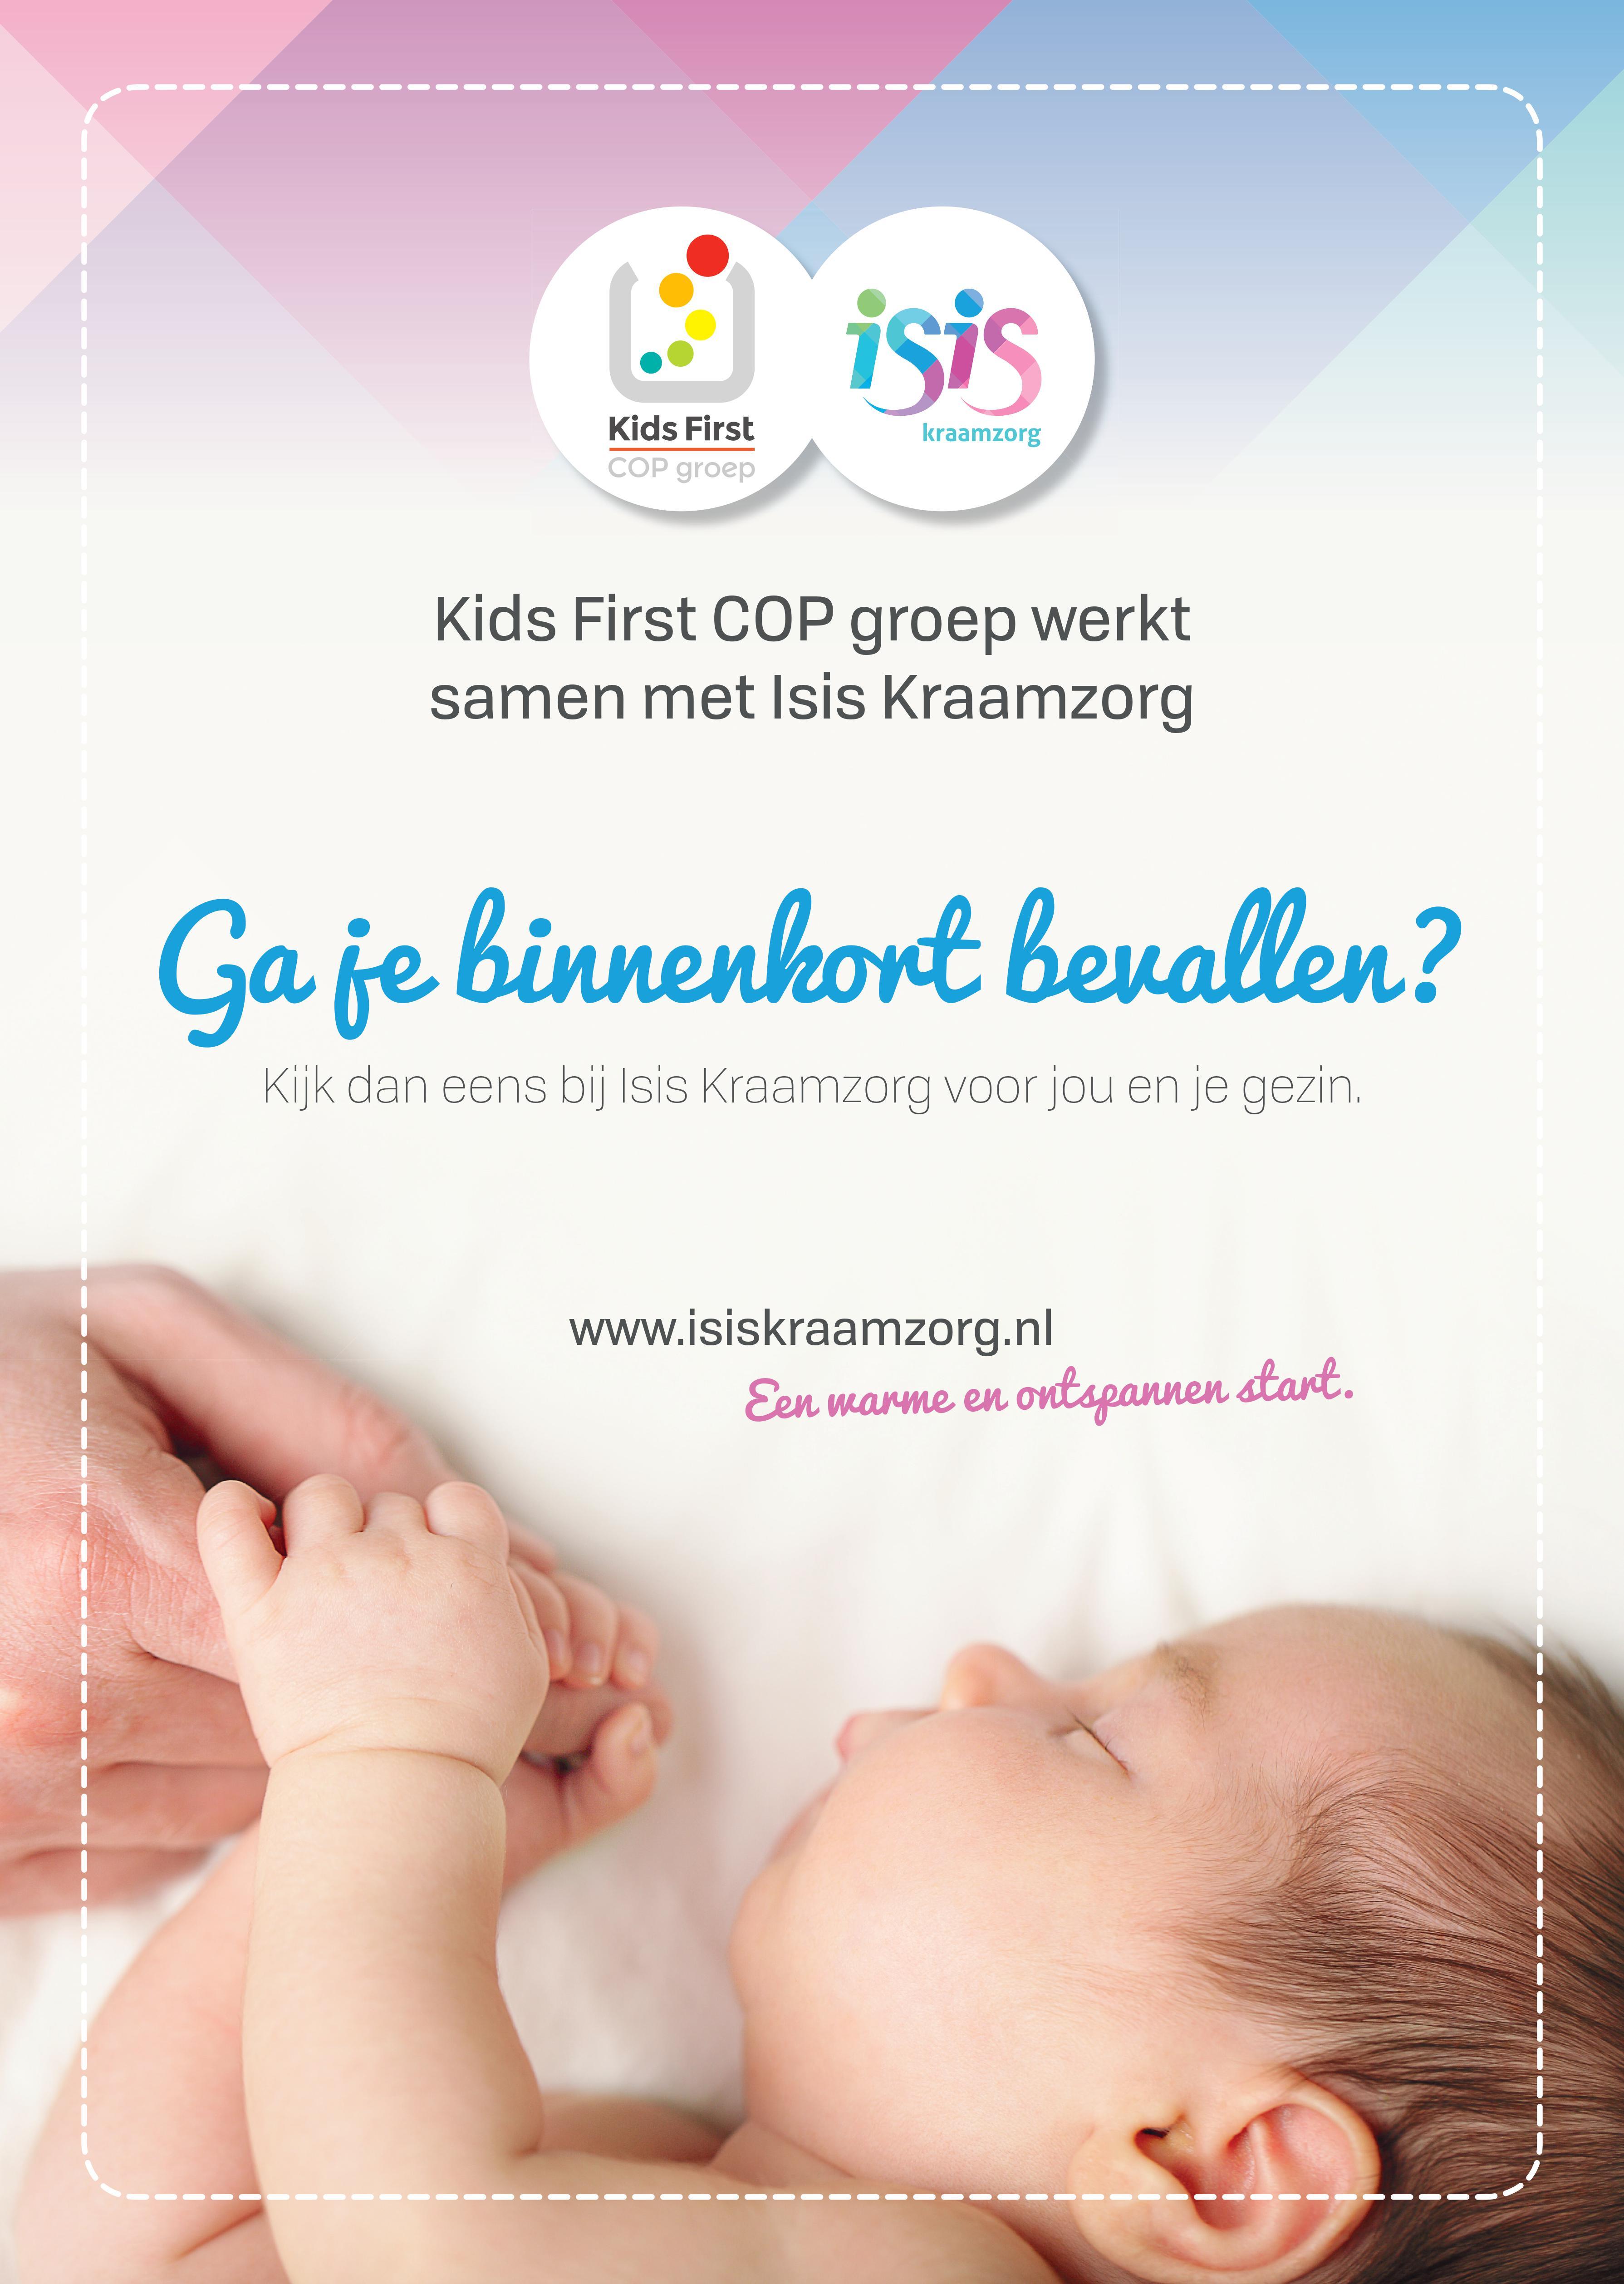 Kids First COP groep werkt samen met Isis Kraamzorg